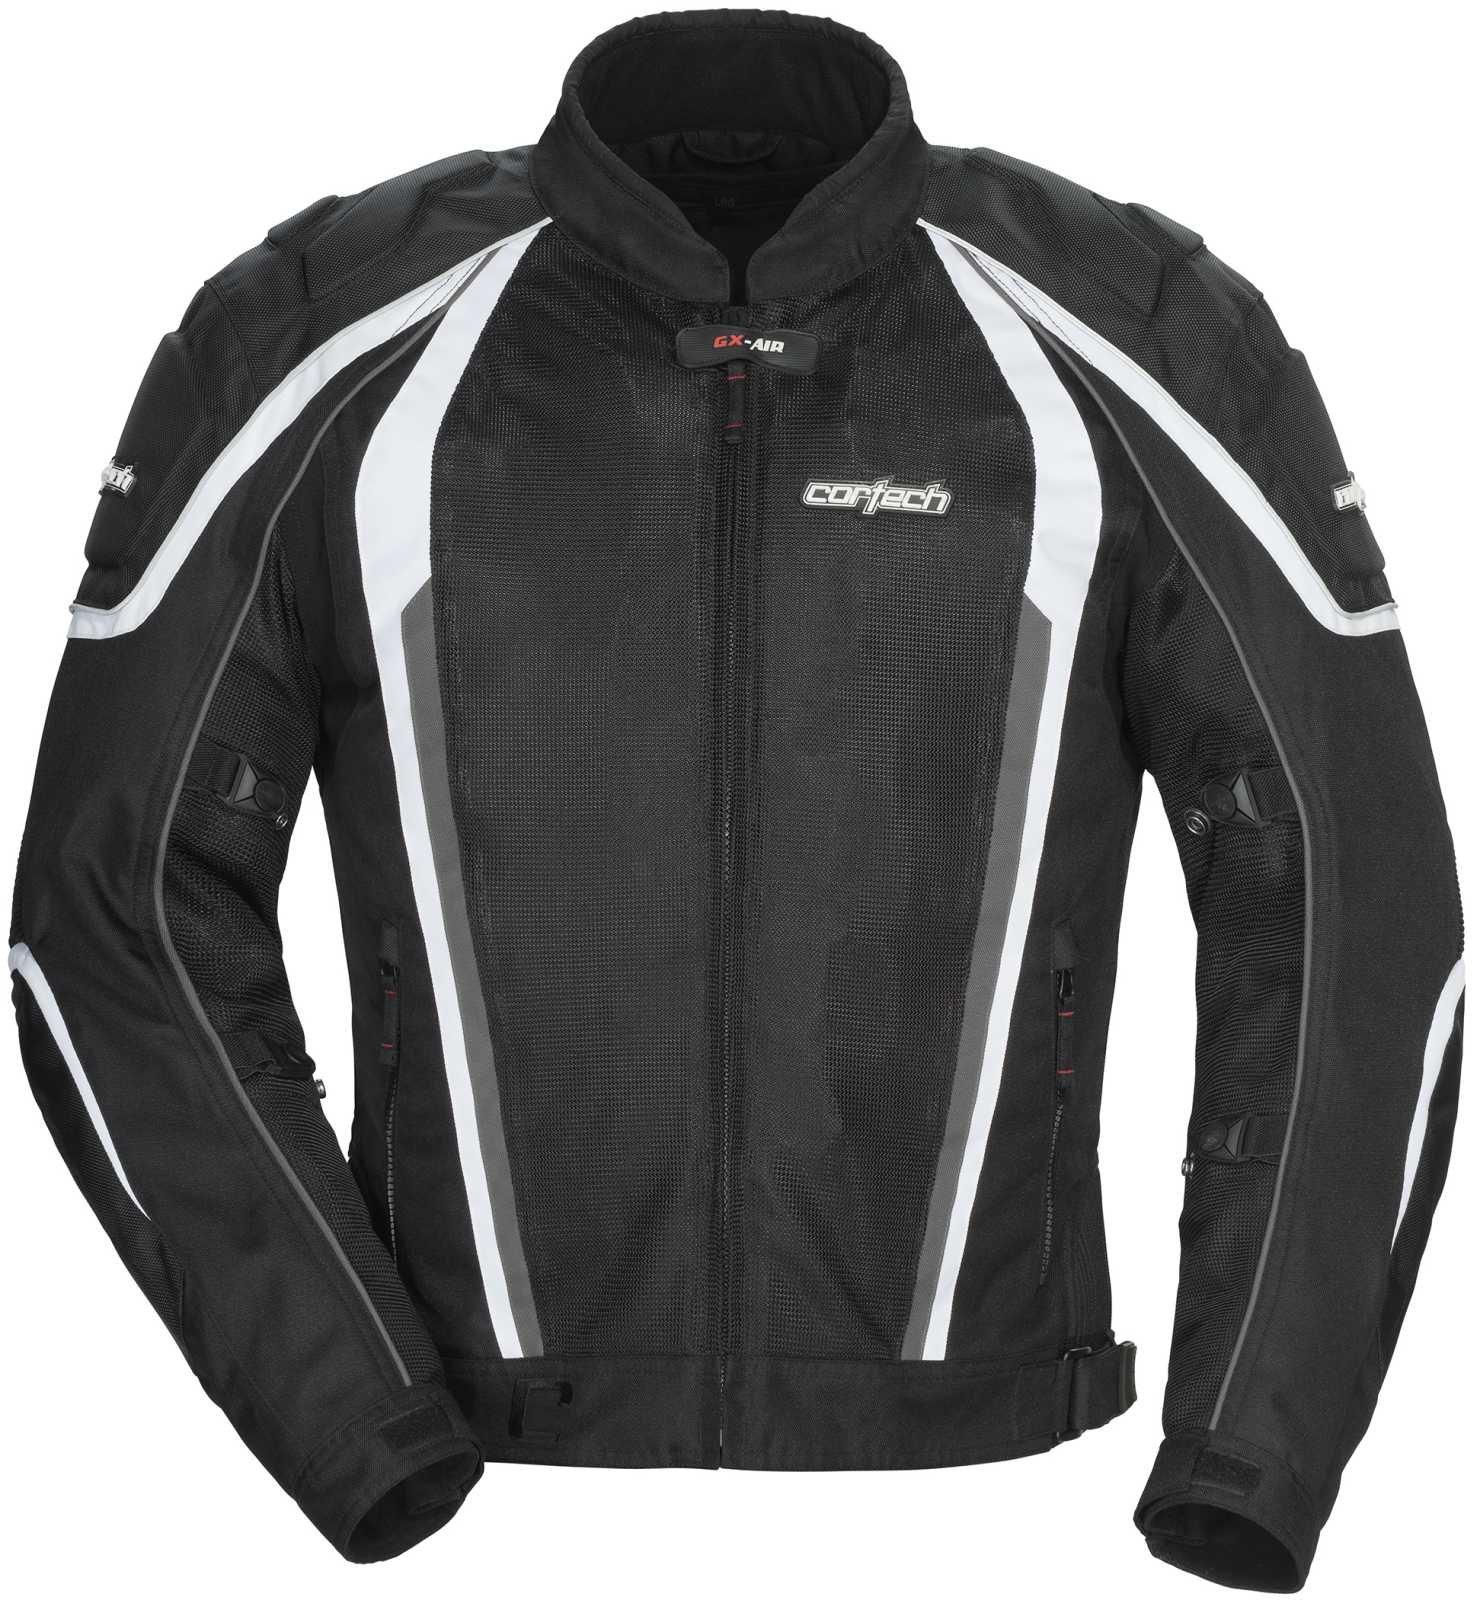 Cortech GX Sport Air 4.0 Adult Mesh Motorcycle Jacket - Black / Large